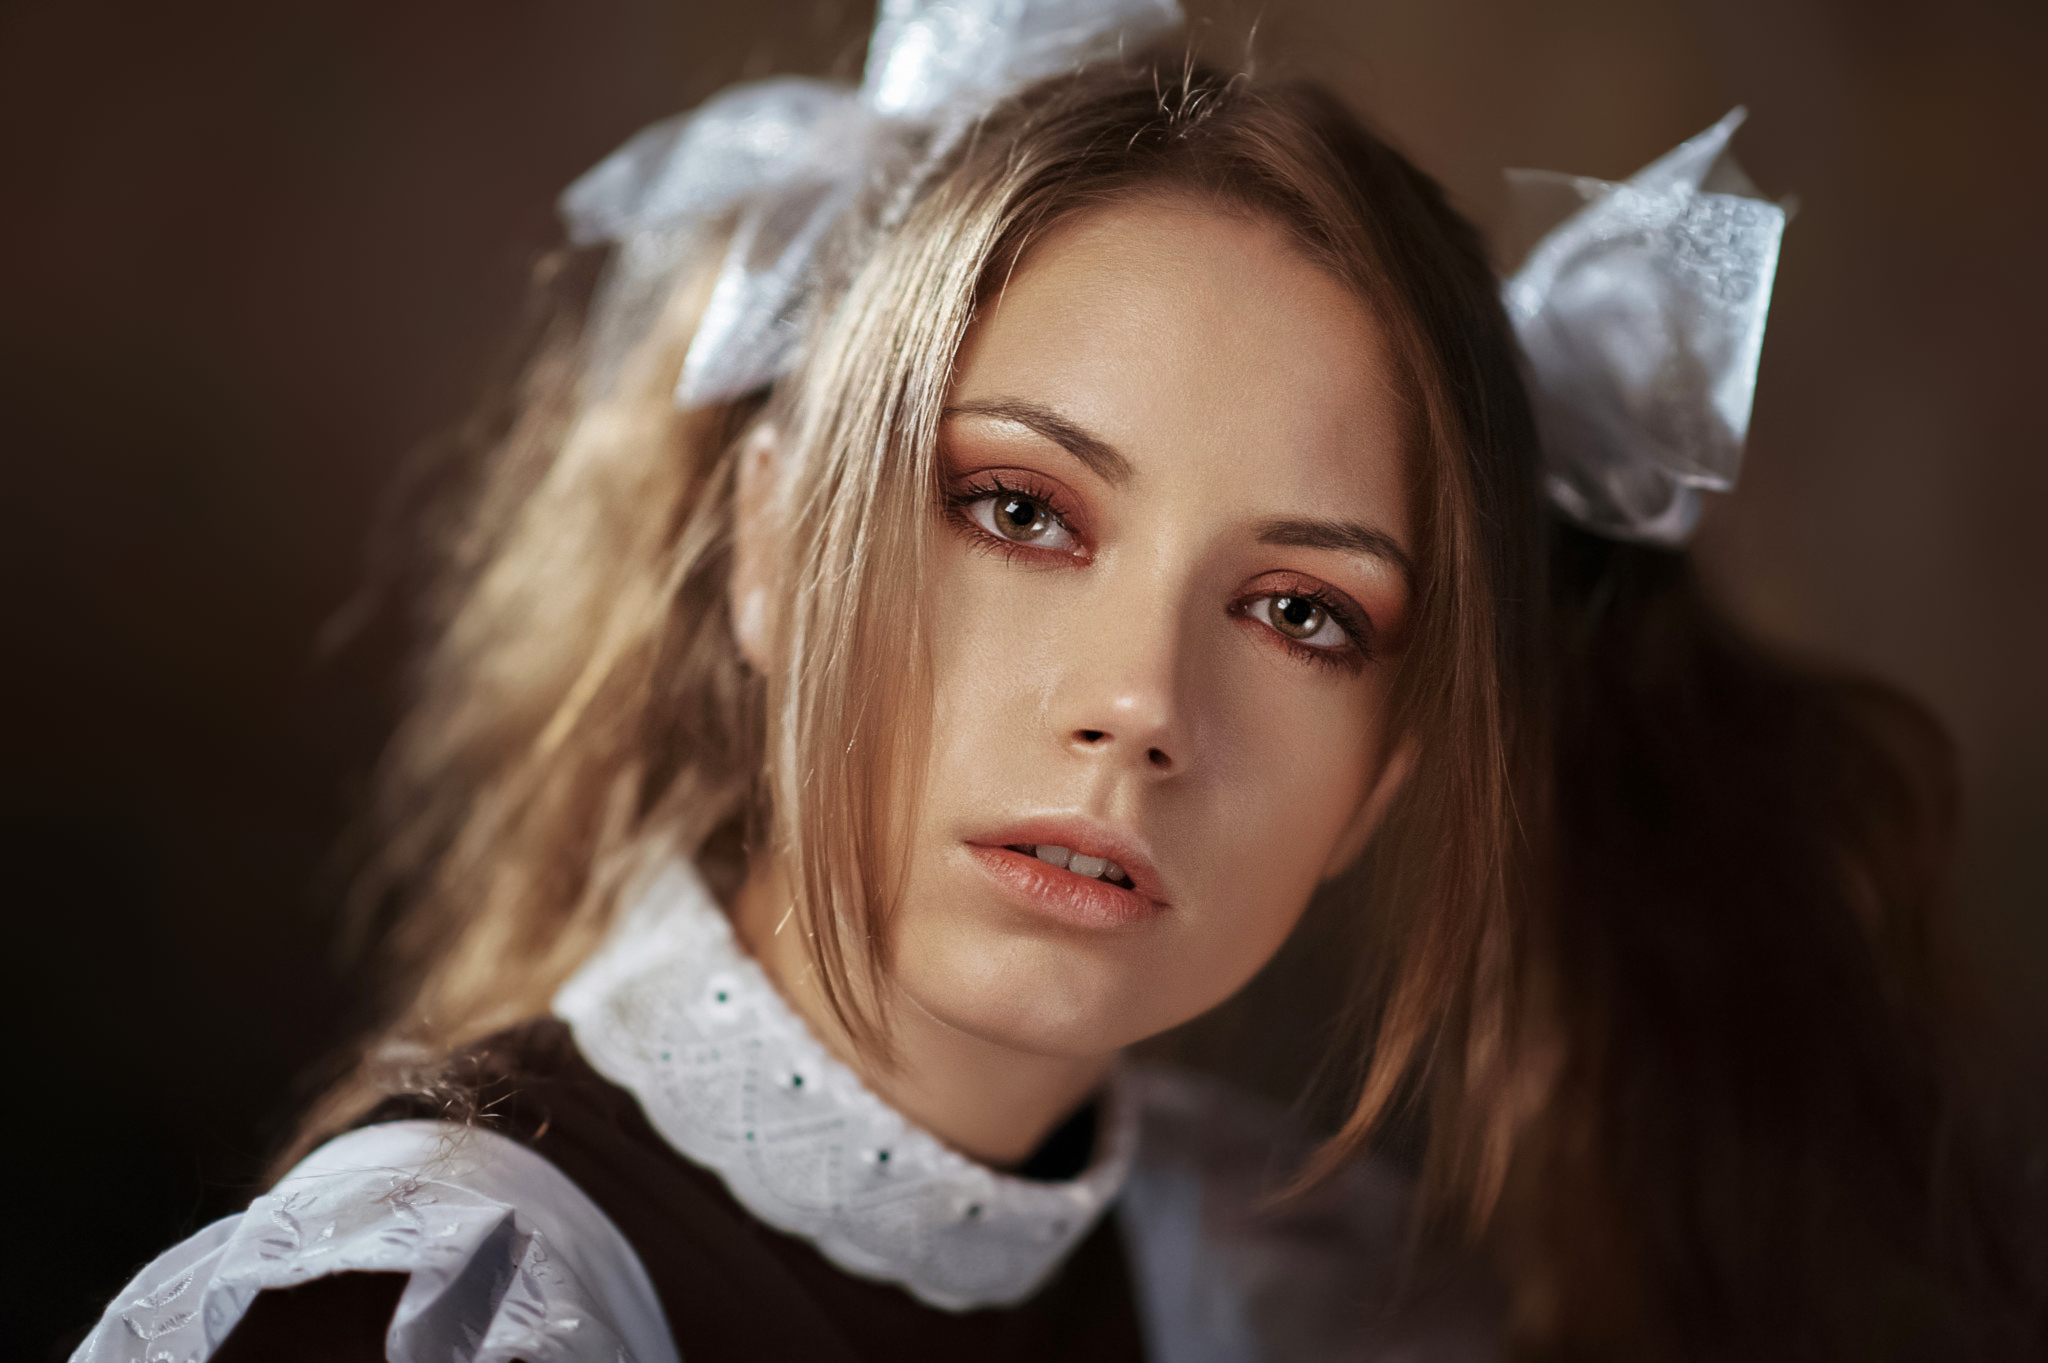 Maxim Maximov Women Ksenia Kokoreva Brunette Hair Accessories Portrait Makeup Eyeshadow Open Mouth S 2048x1363